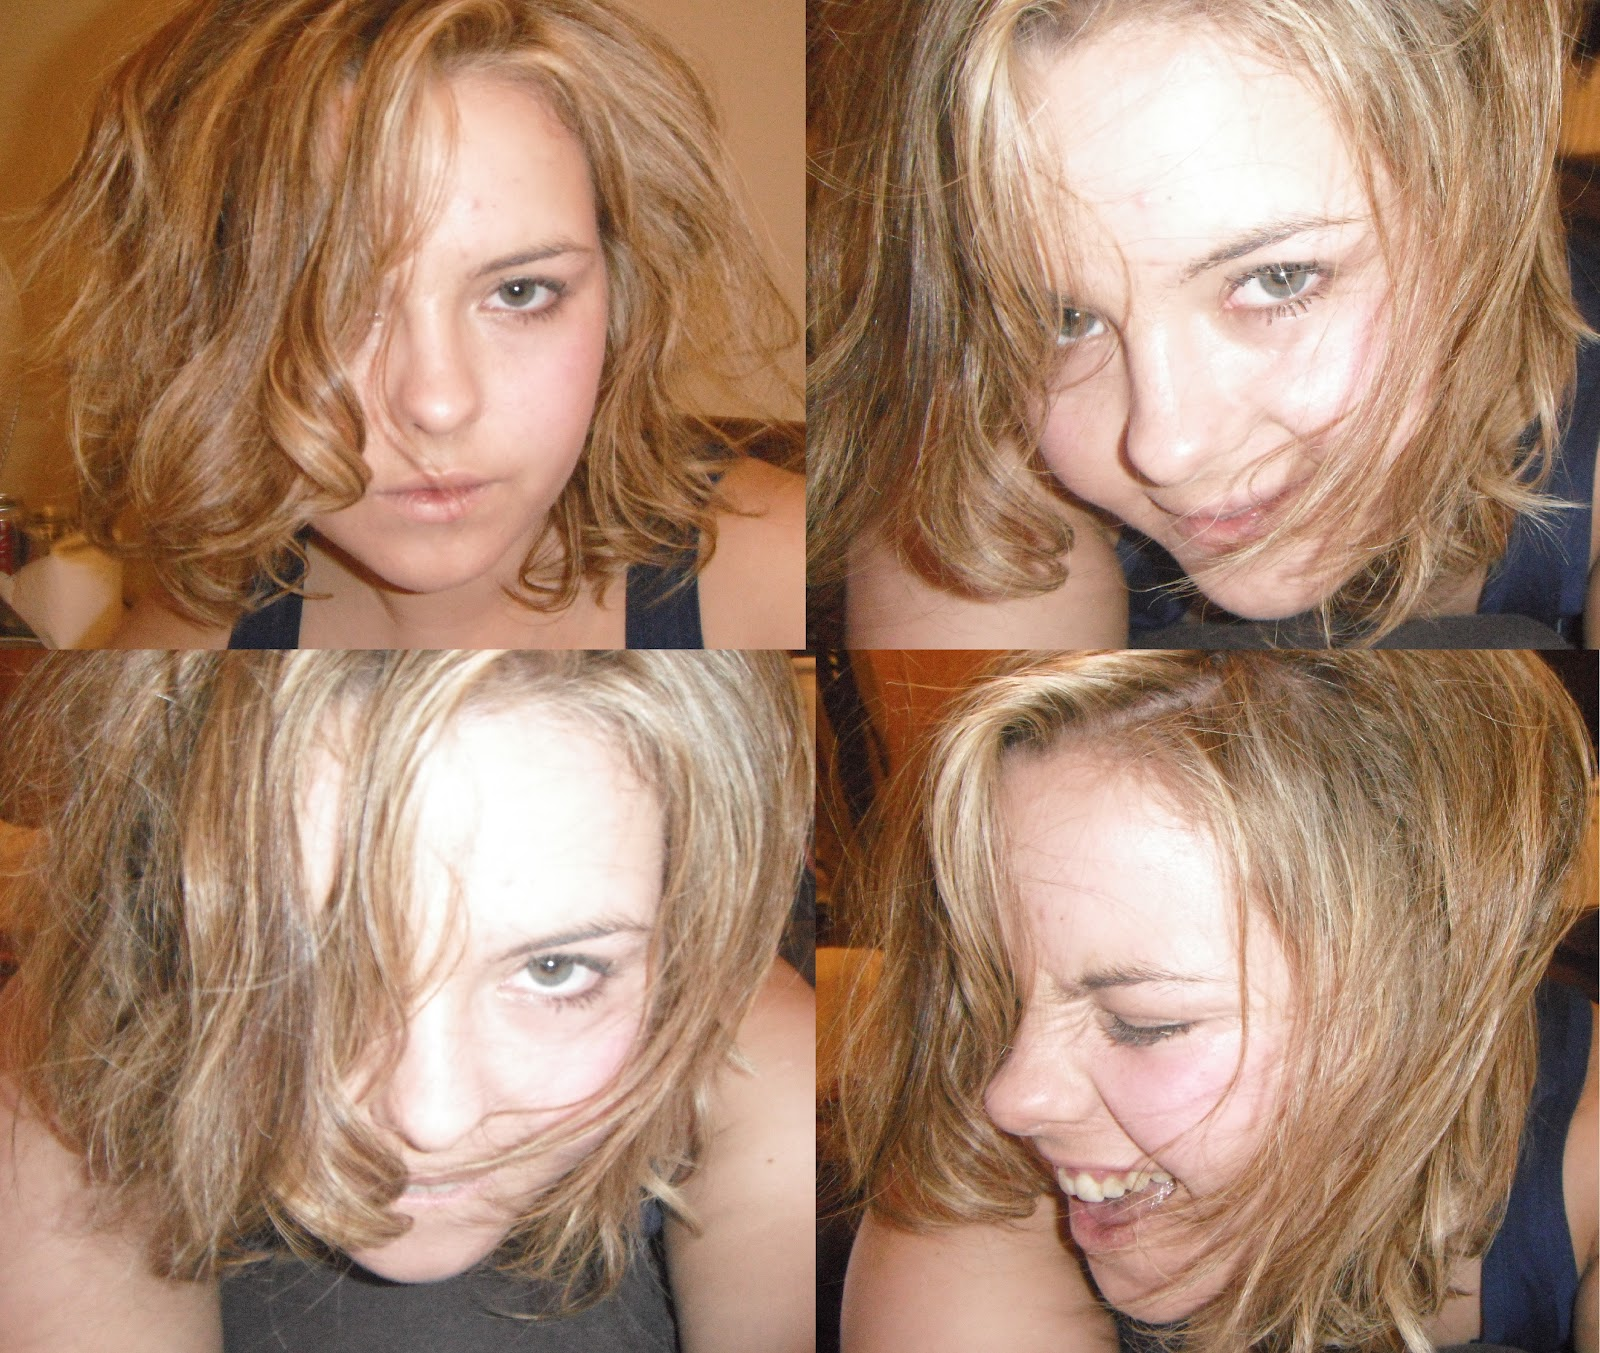 http://4.bp.blogspot.com/--wt_N-ZjME8/UEfXC_AaJtI/AAAAAAAAId8/rLPGMGYN0Bw/s1600/blonde.jpg